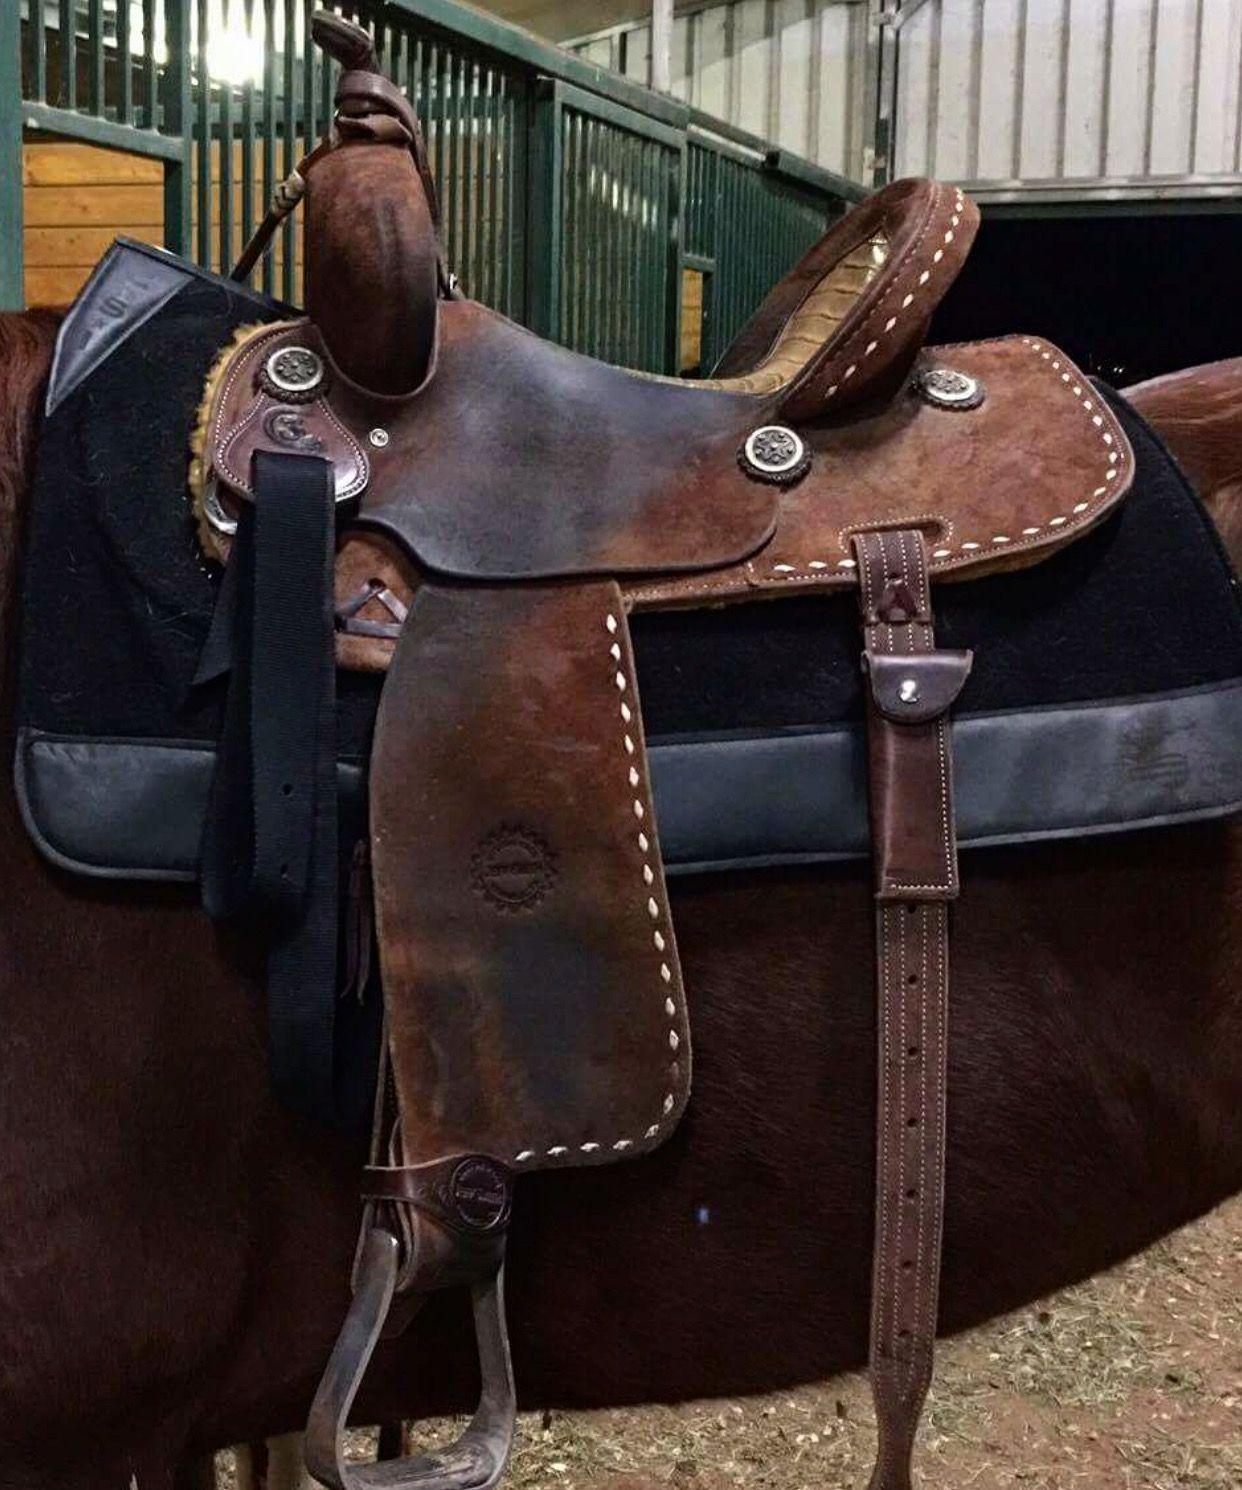 Pin by Chali Pinkston on Barrel saddles | Barrel racing saddles